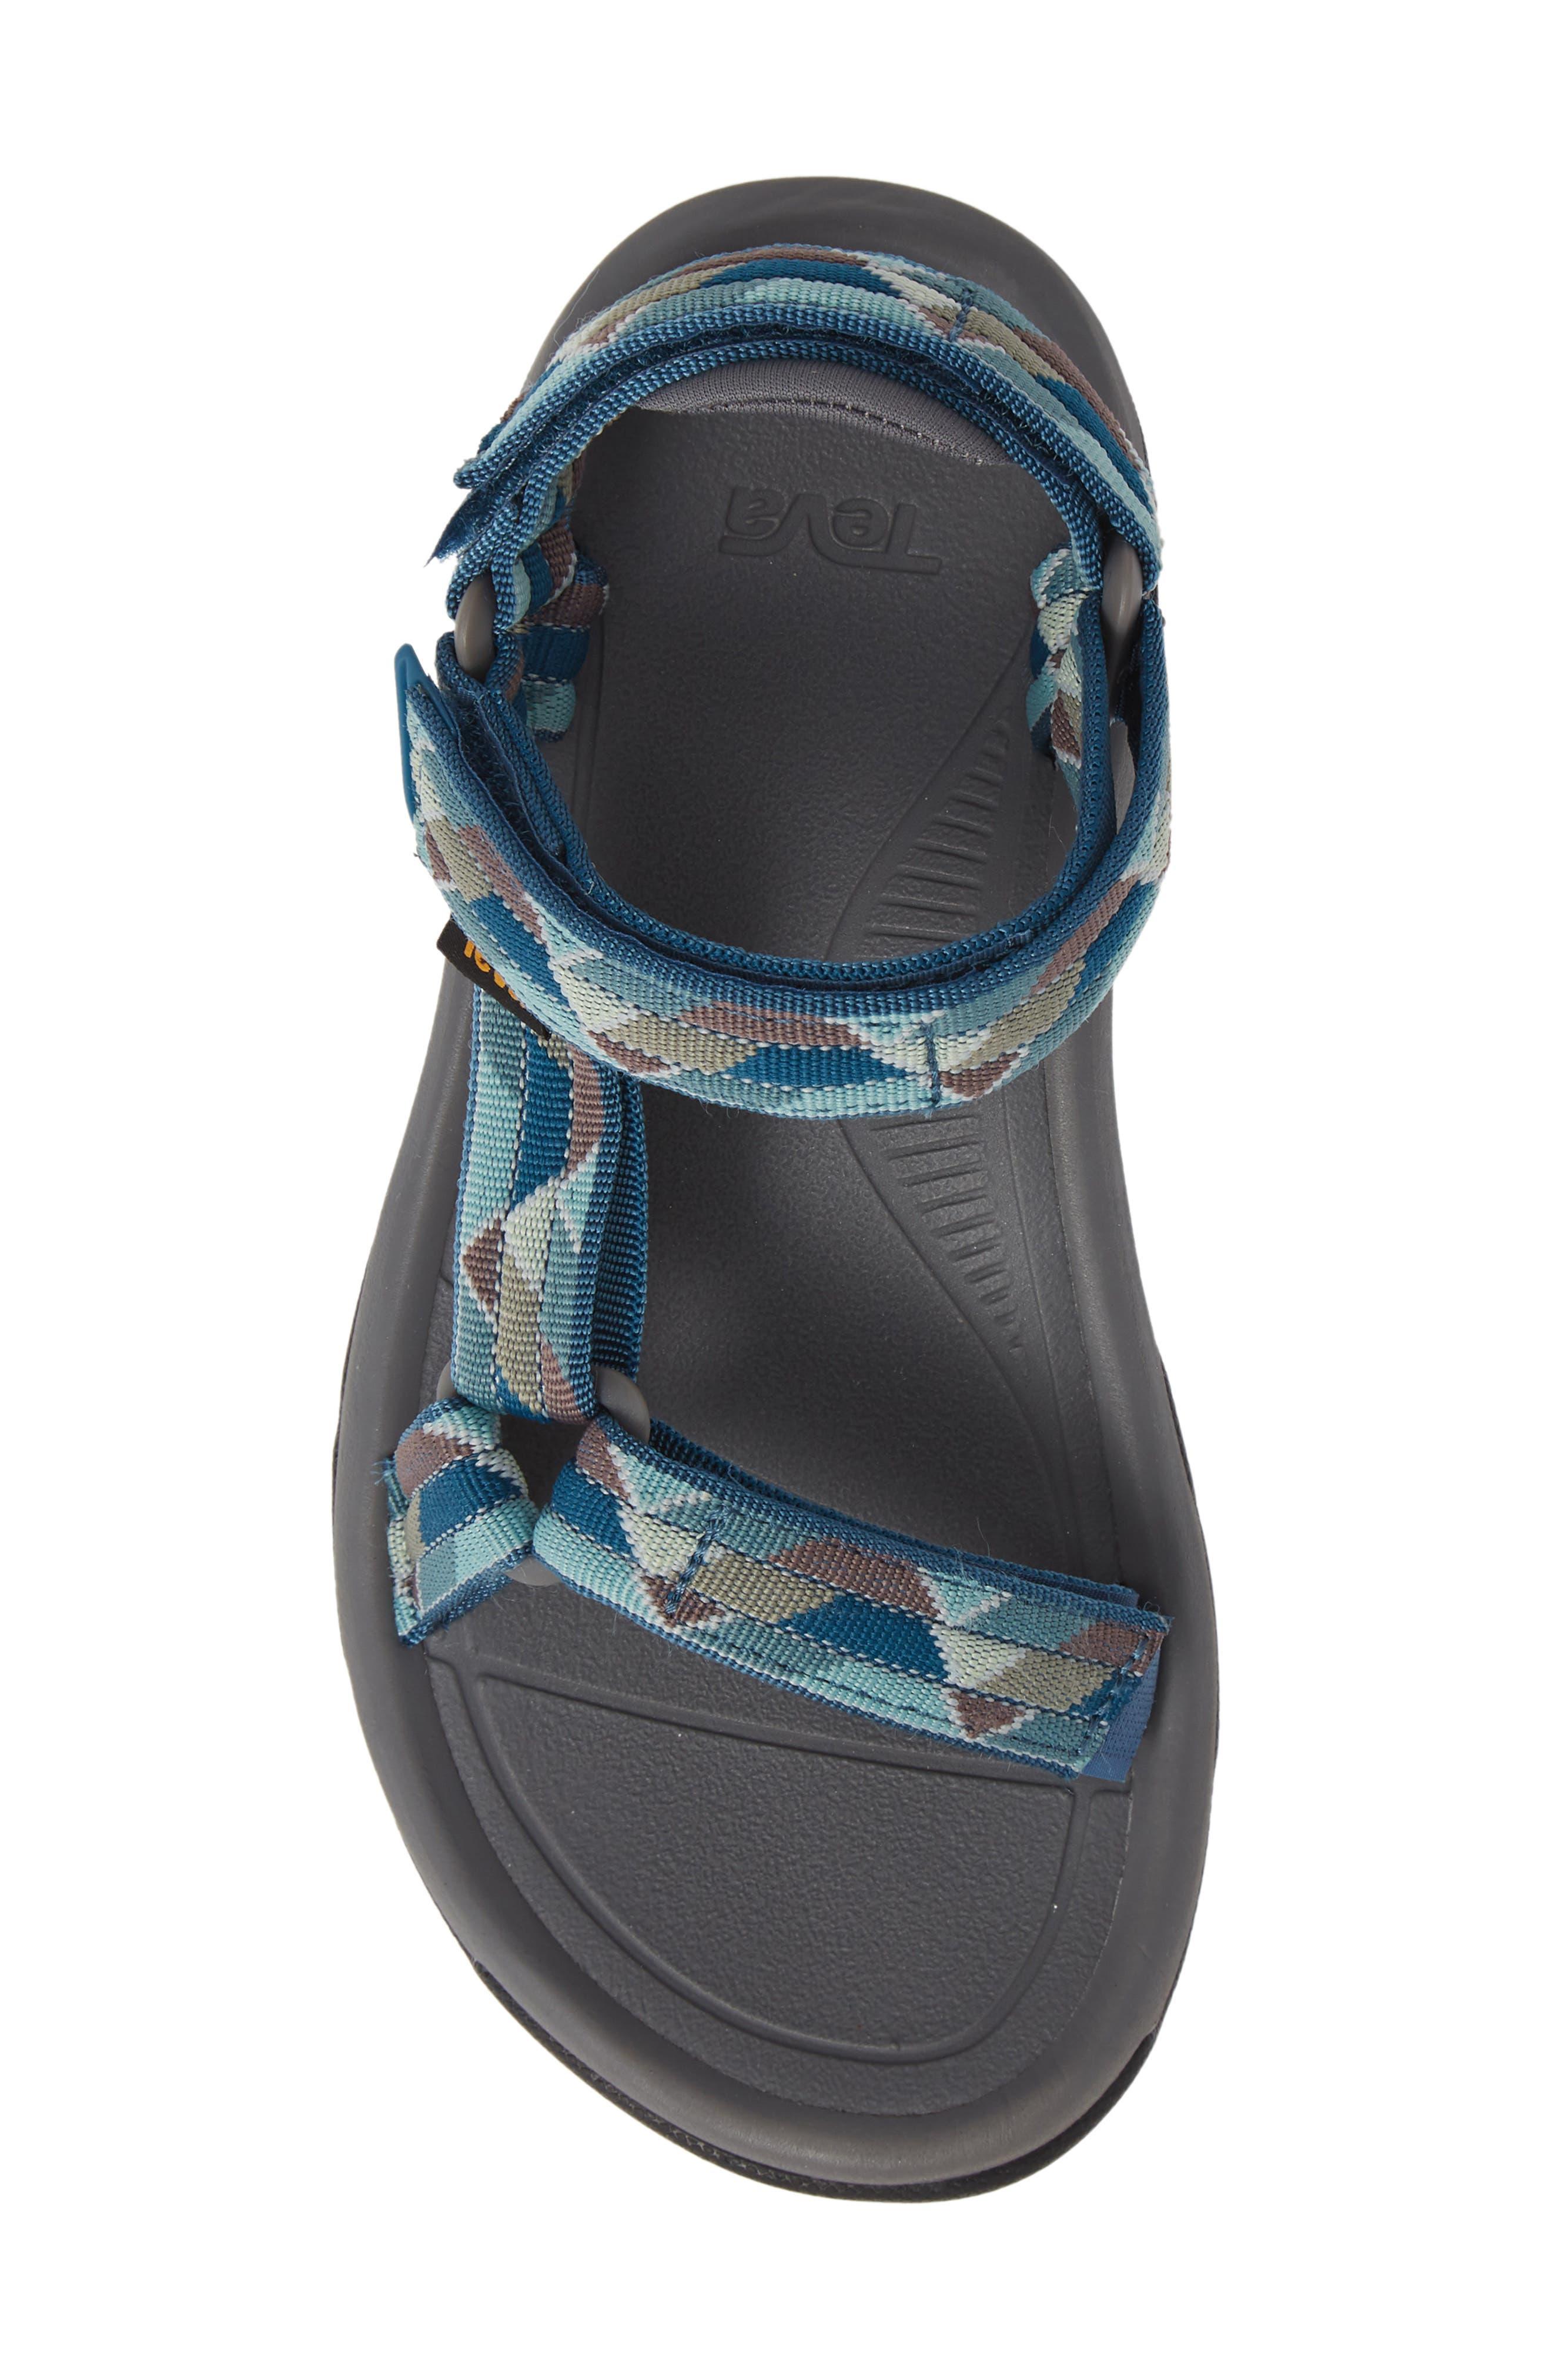 Hurricane XLT 2 Sandal,                             Alternate thumbnail 3, color,                             Blue Fabric